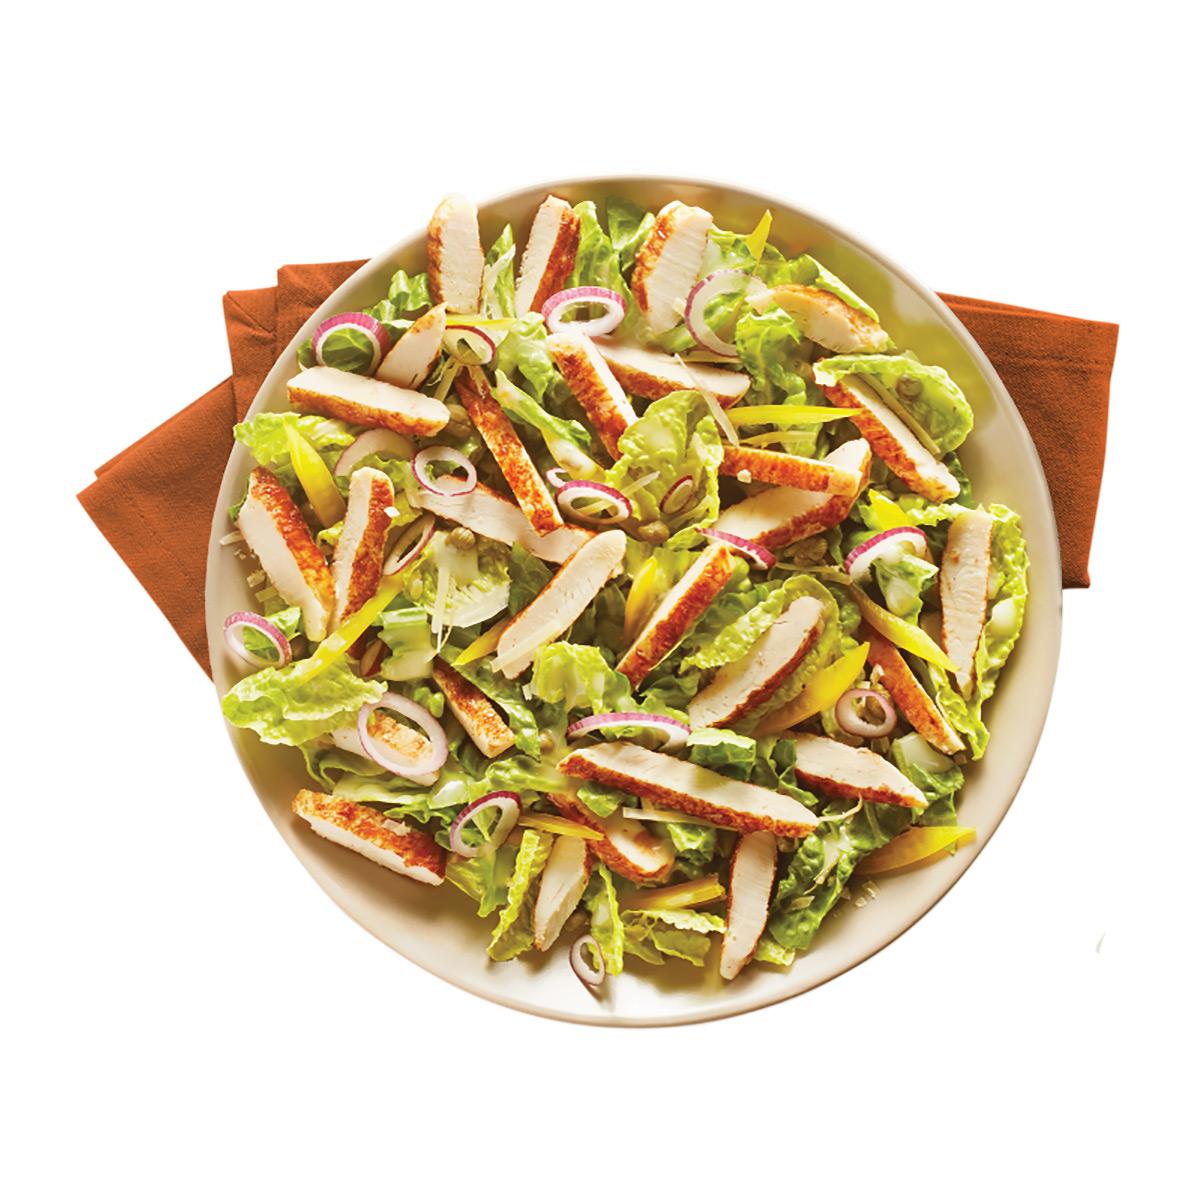 298399 sadia grilled chicken breast strips 2 kg lr ppp